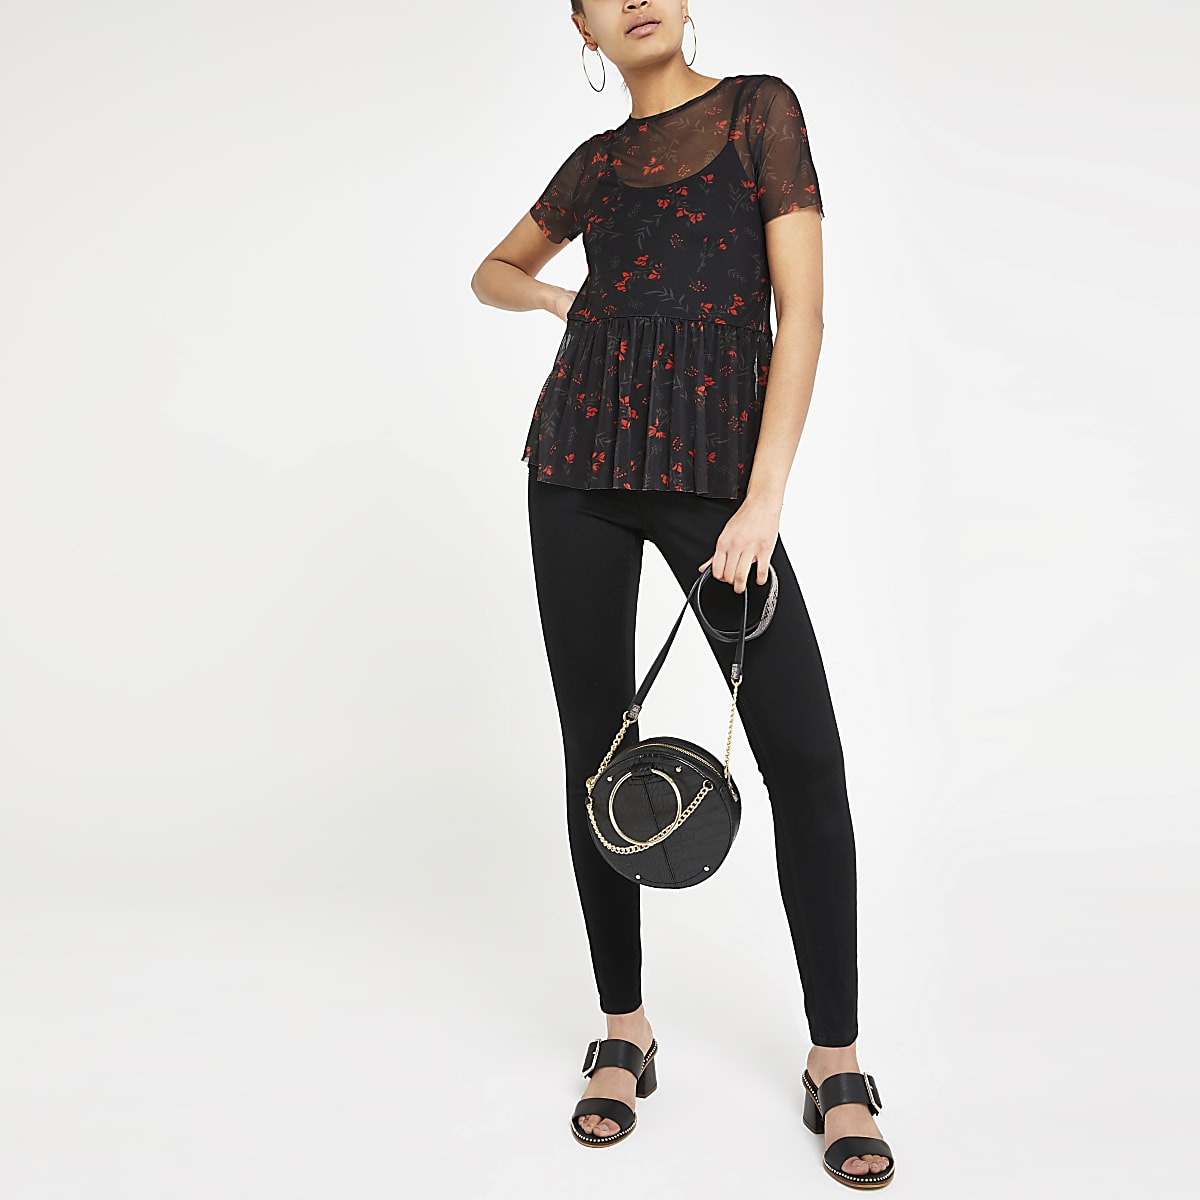 Black floral mesh peplum top